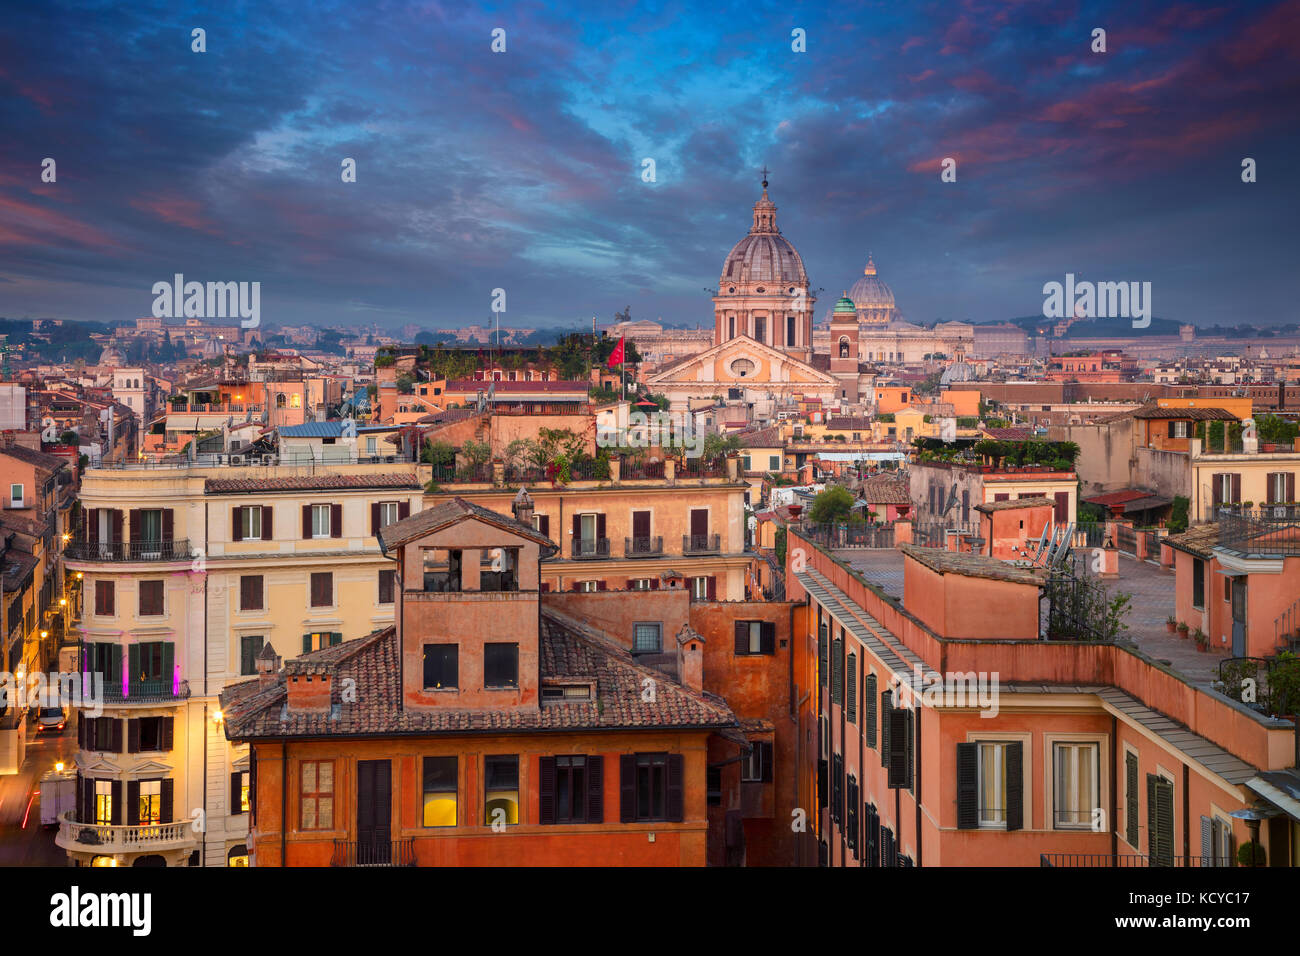 Rome. Cityscape image of Rome, Italy during sunrise. - Stock Image